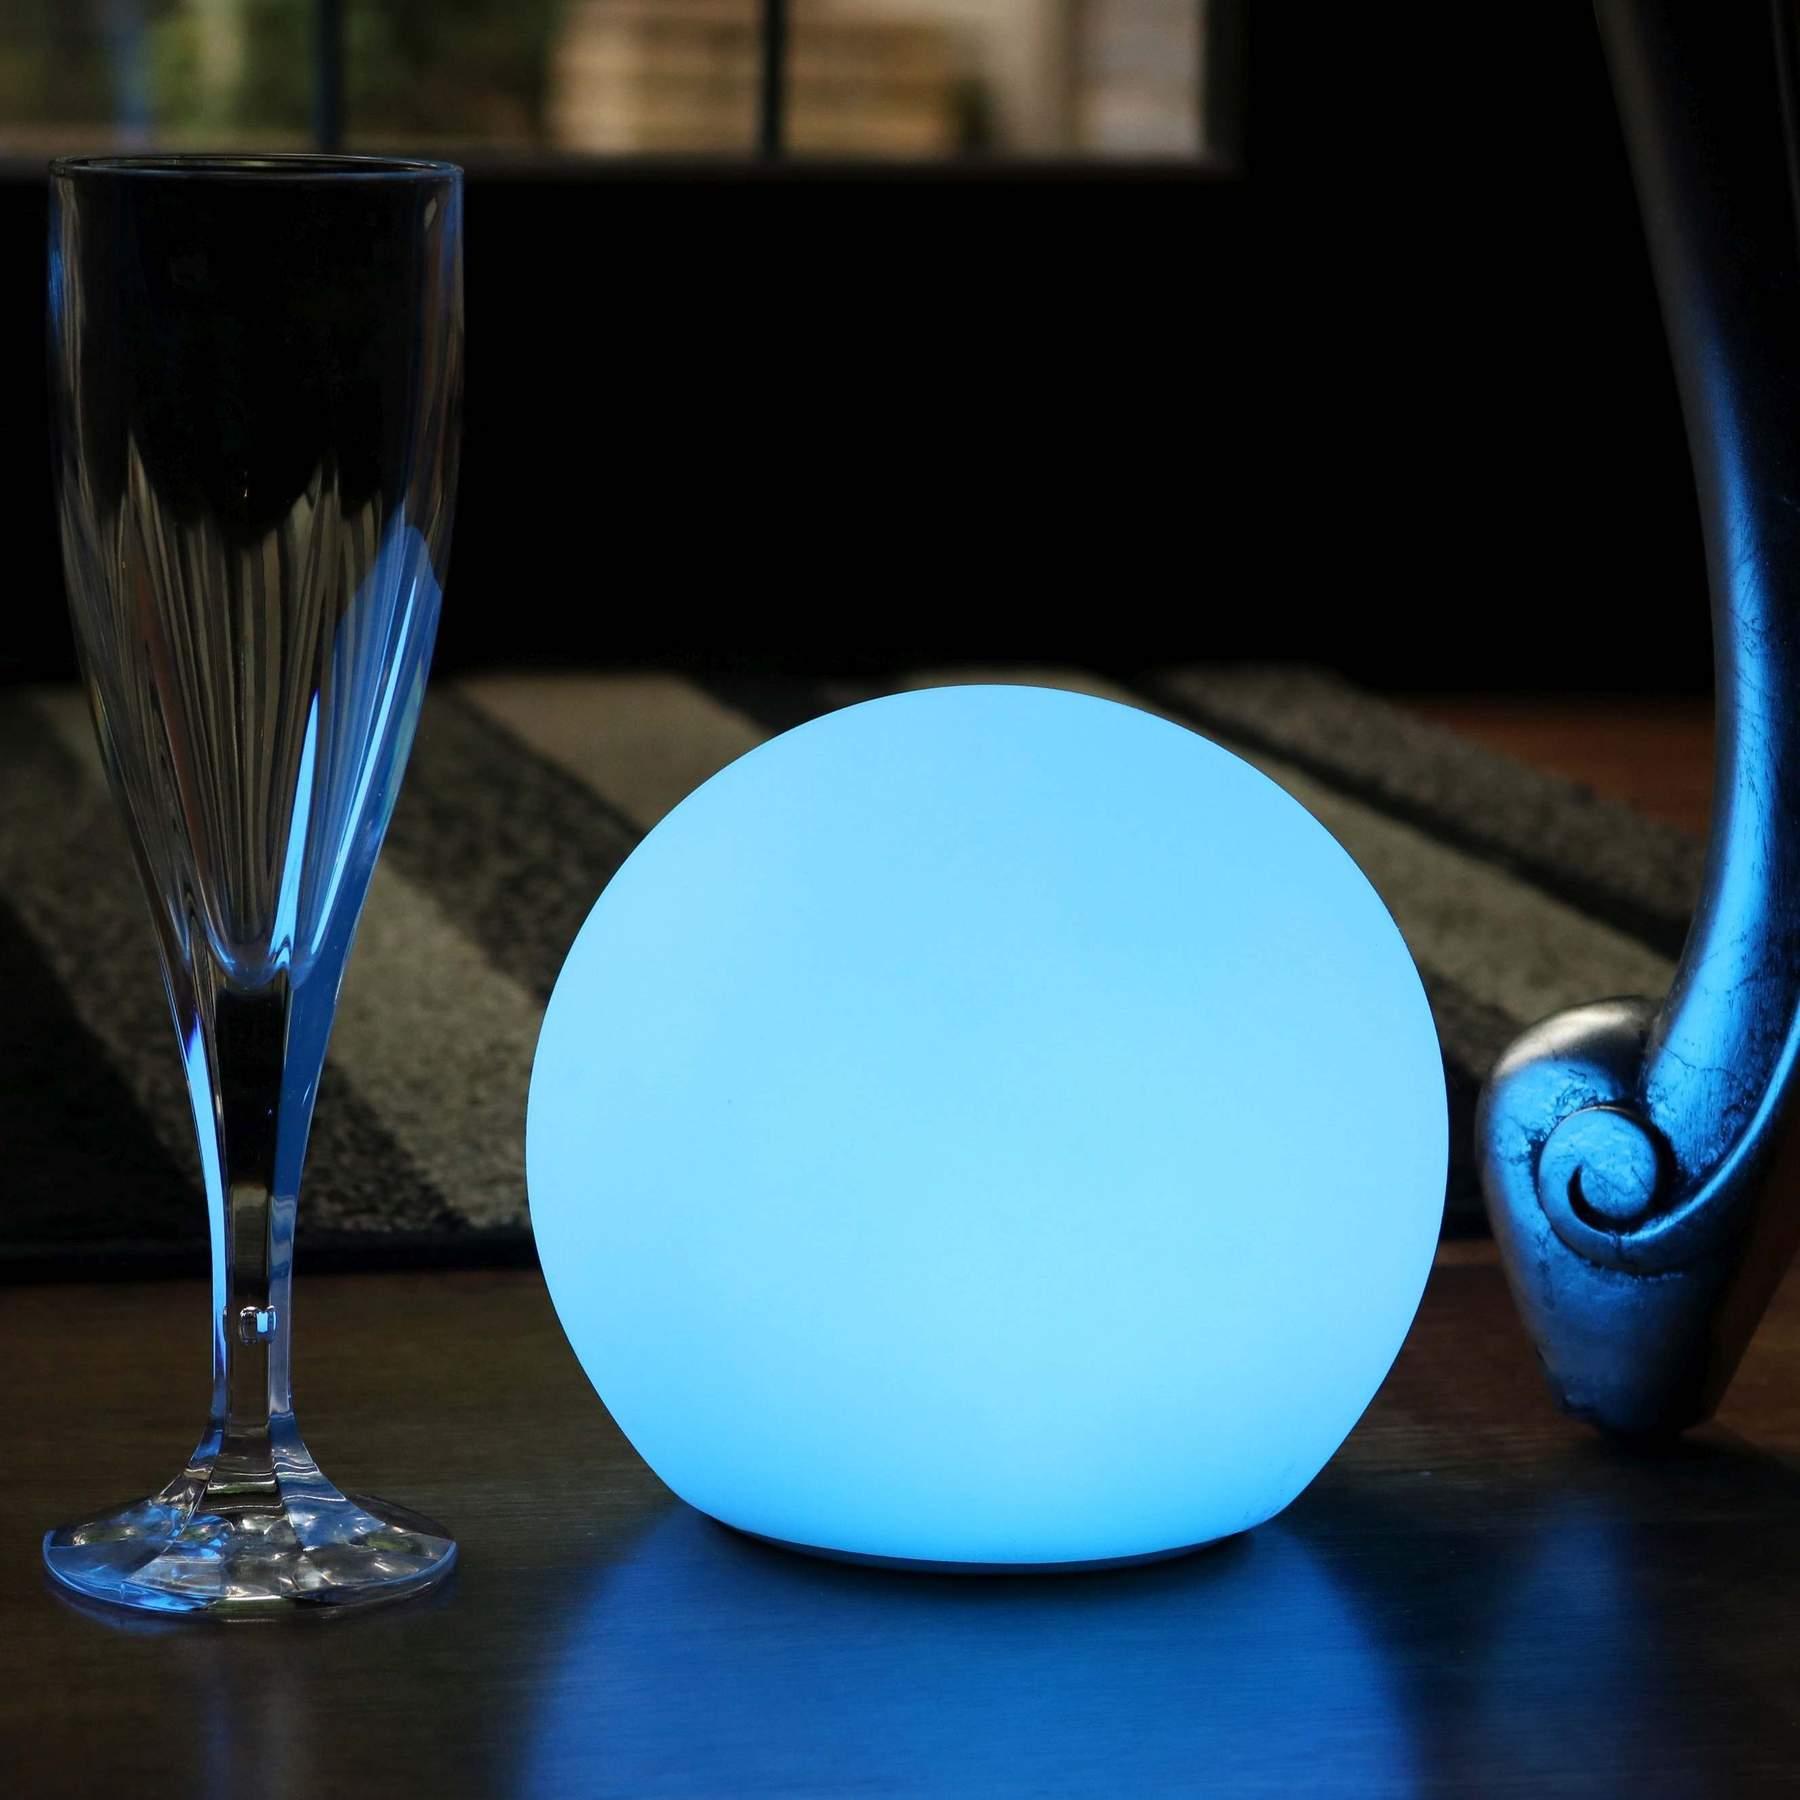 15 cm Table Orb Balls, 5.9 inch Light Up Ball Lamps, Waterproof LED Balls